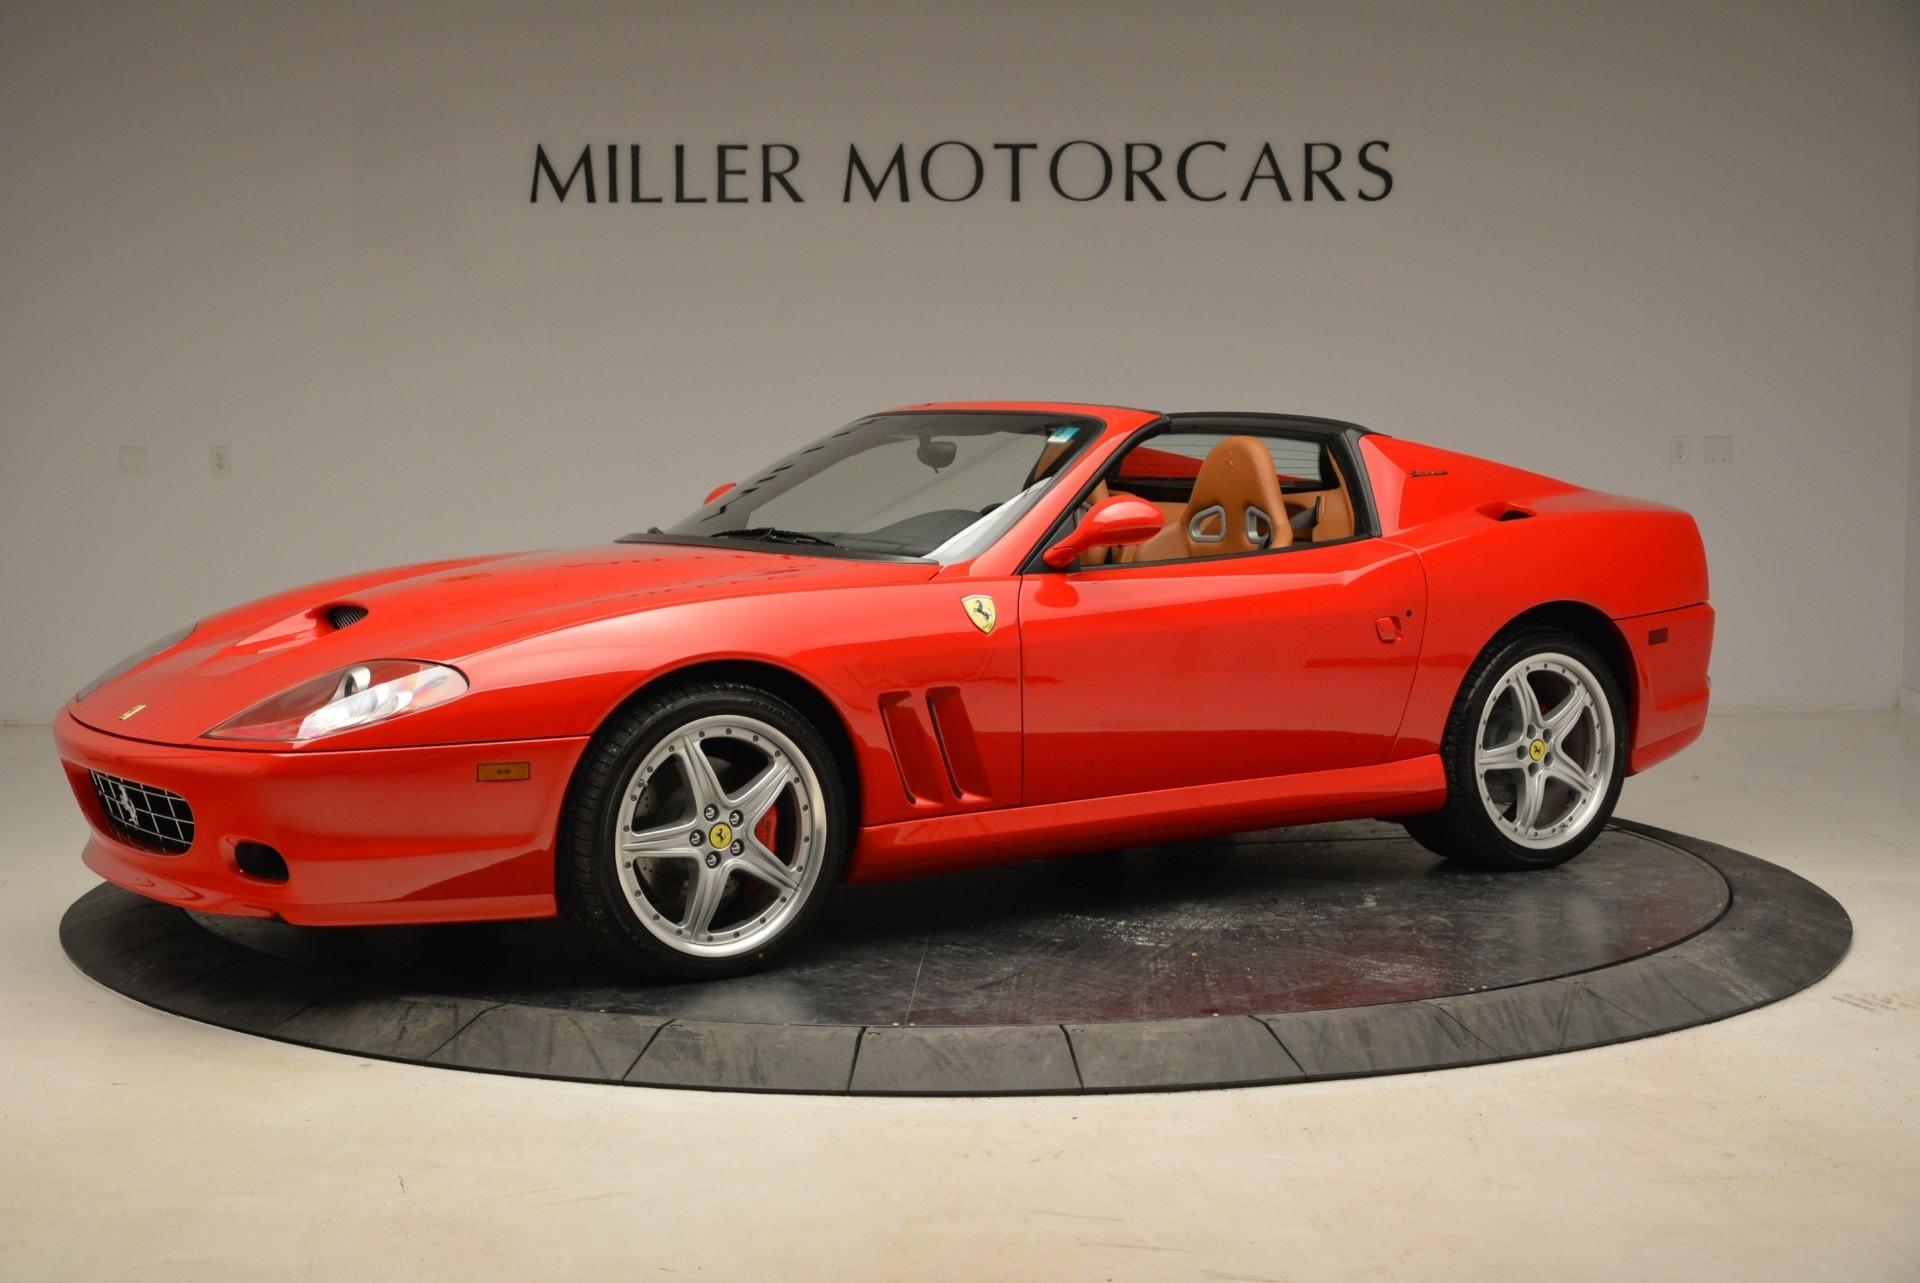 Used 2005 FERRARI Superamerica for sale $299,900 at Alfa Romeo of Greenwich in Greenwich CT 06830 1